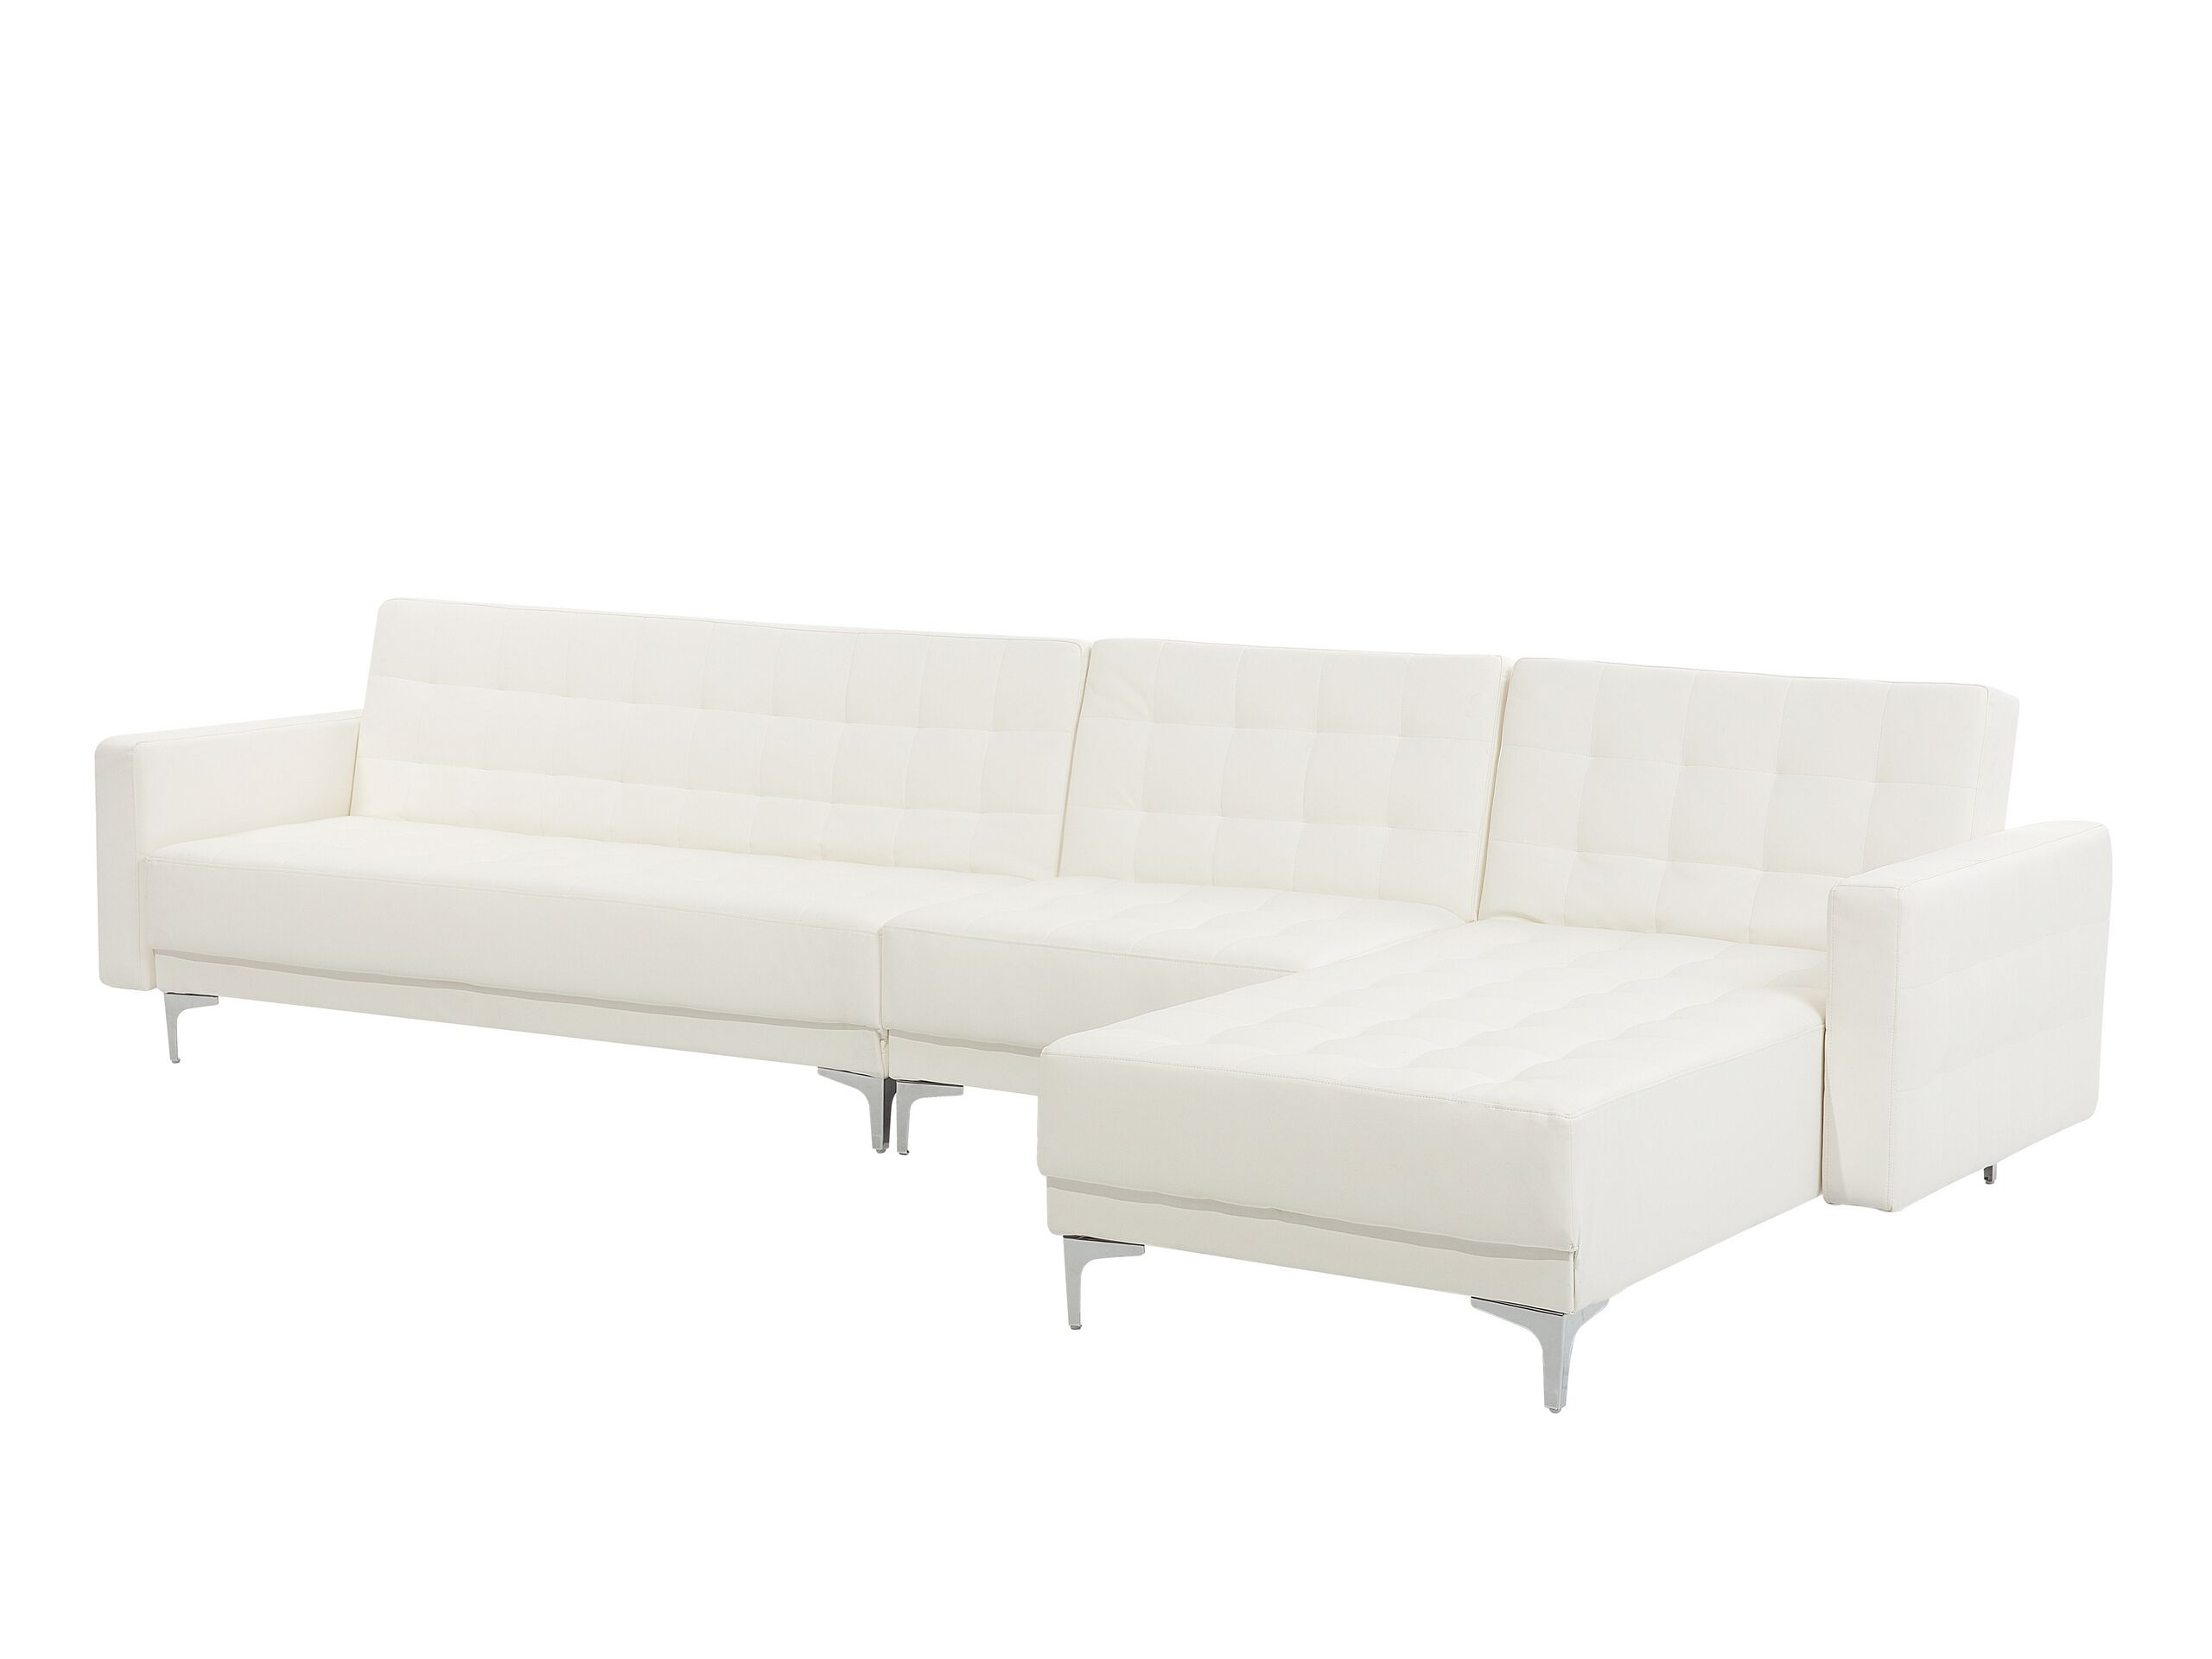 Canapé angle gauche convertible simili-cuir blanc 5 places